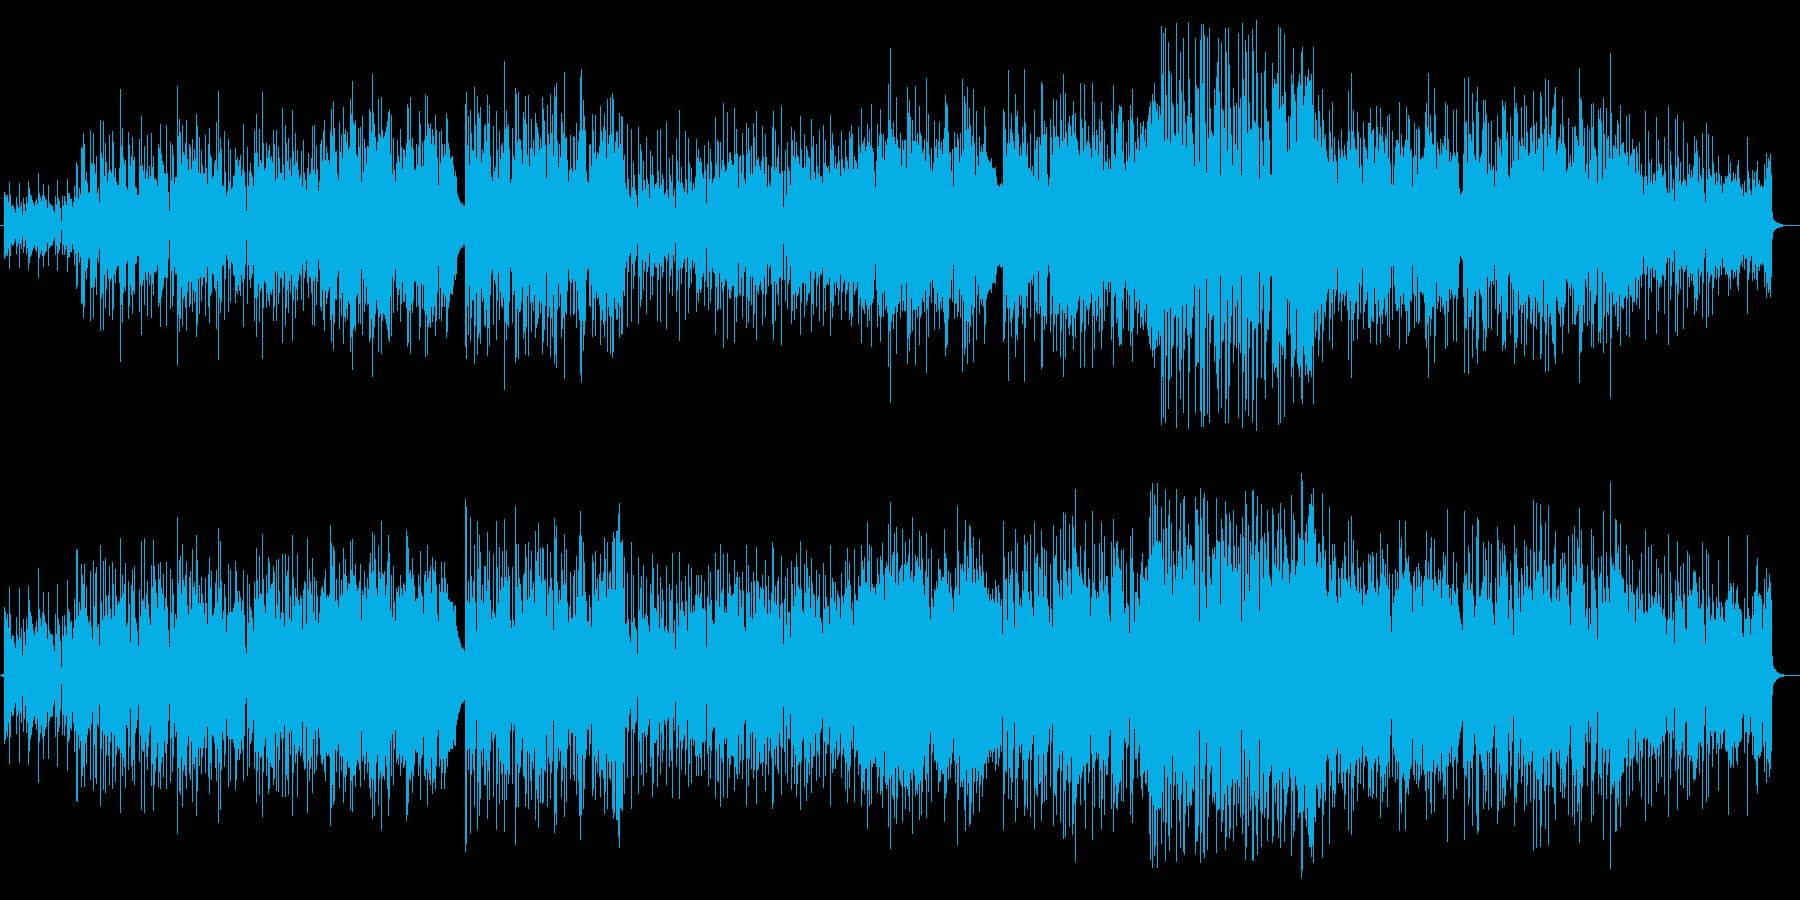 Slow and ennui dark rock's reproduced waveform